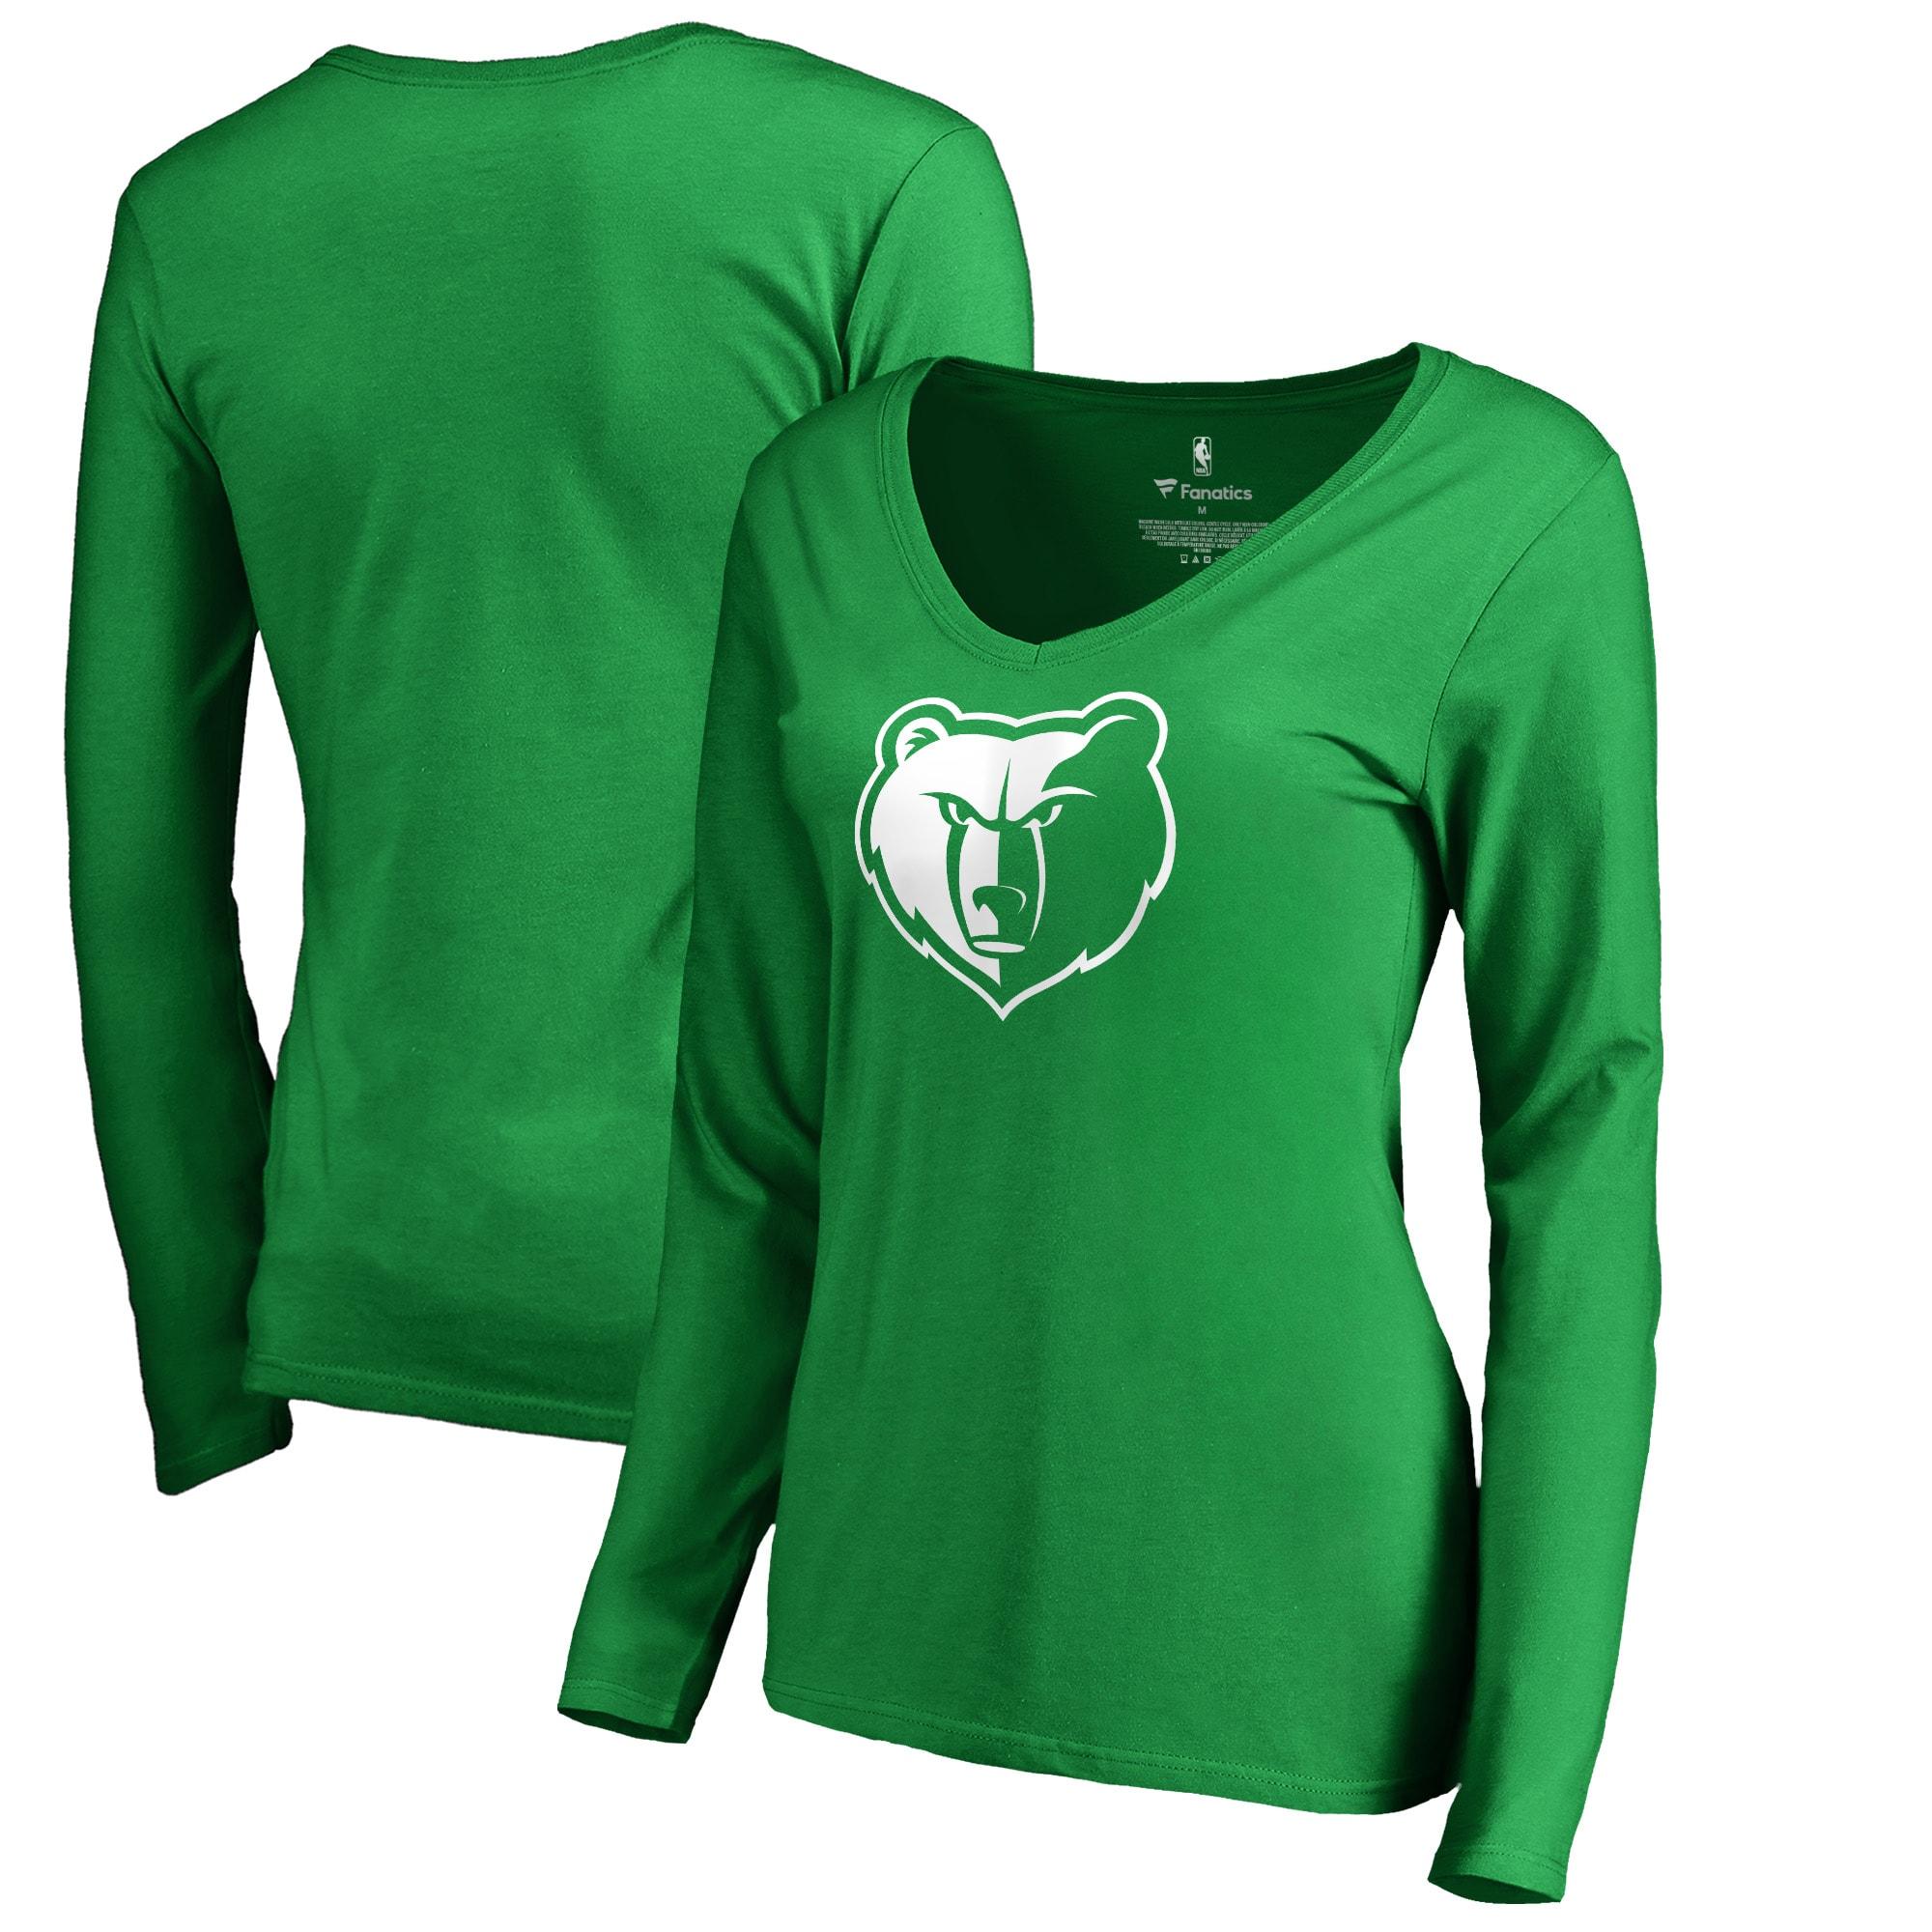 Memphis Grizzlies Fanatics Branded Women's St. Patrick's Day White Logo Long Sleeve V-Neck T-Shirt - Green